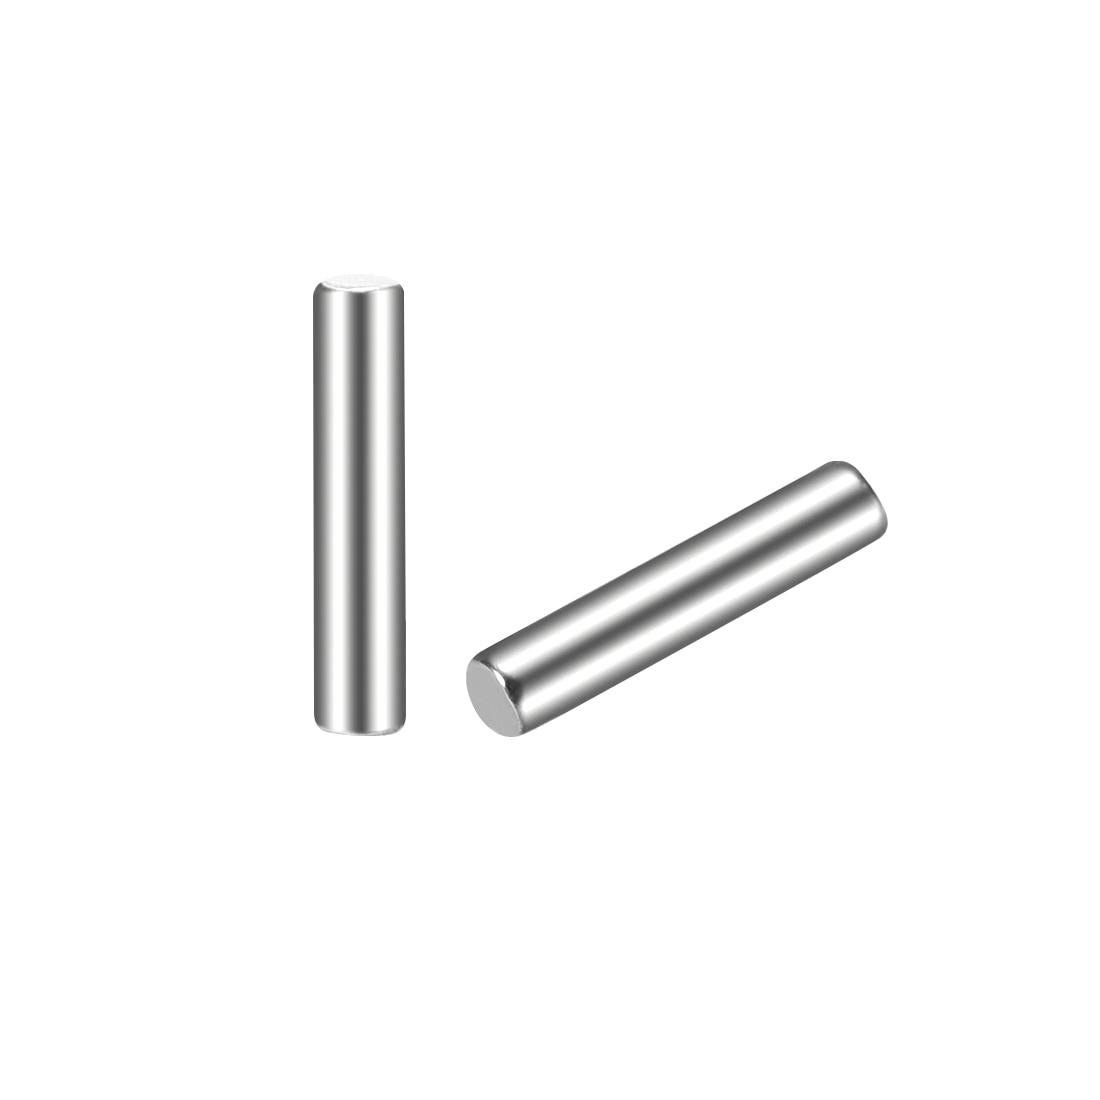 100 Pcs 2.7mm x 15.8mm Parallel Dowel Pins Fasten Elements Silver Tone